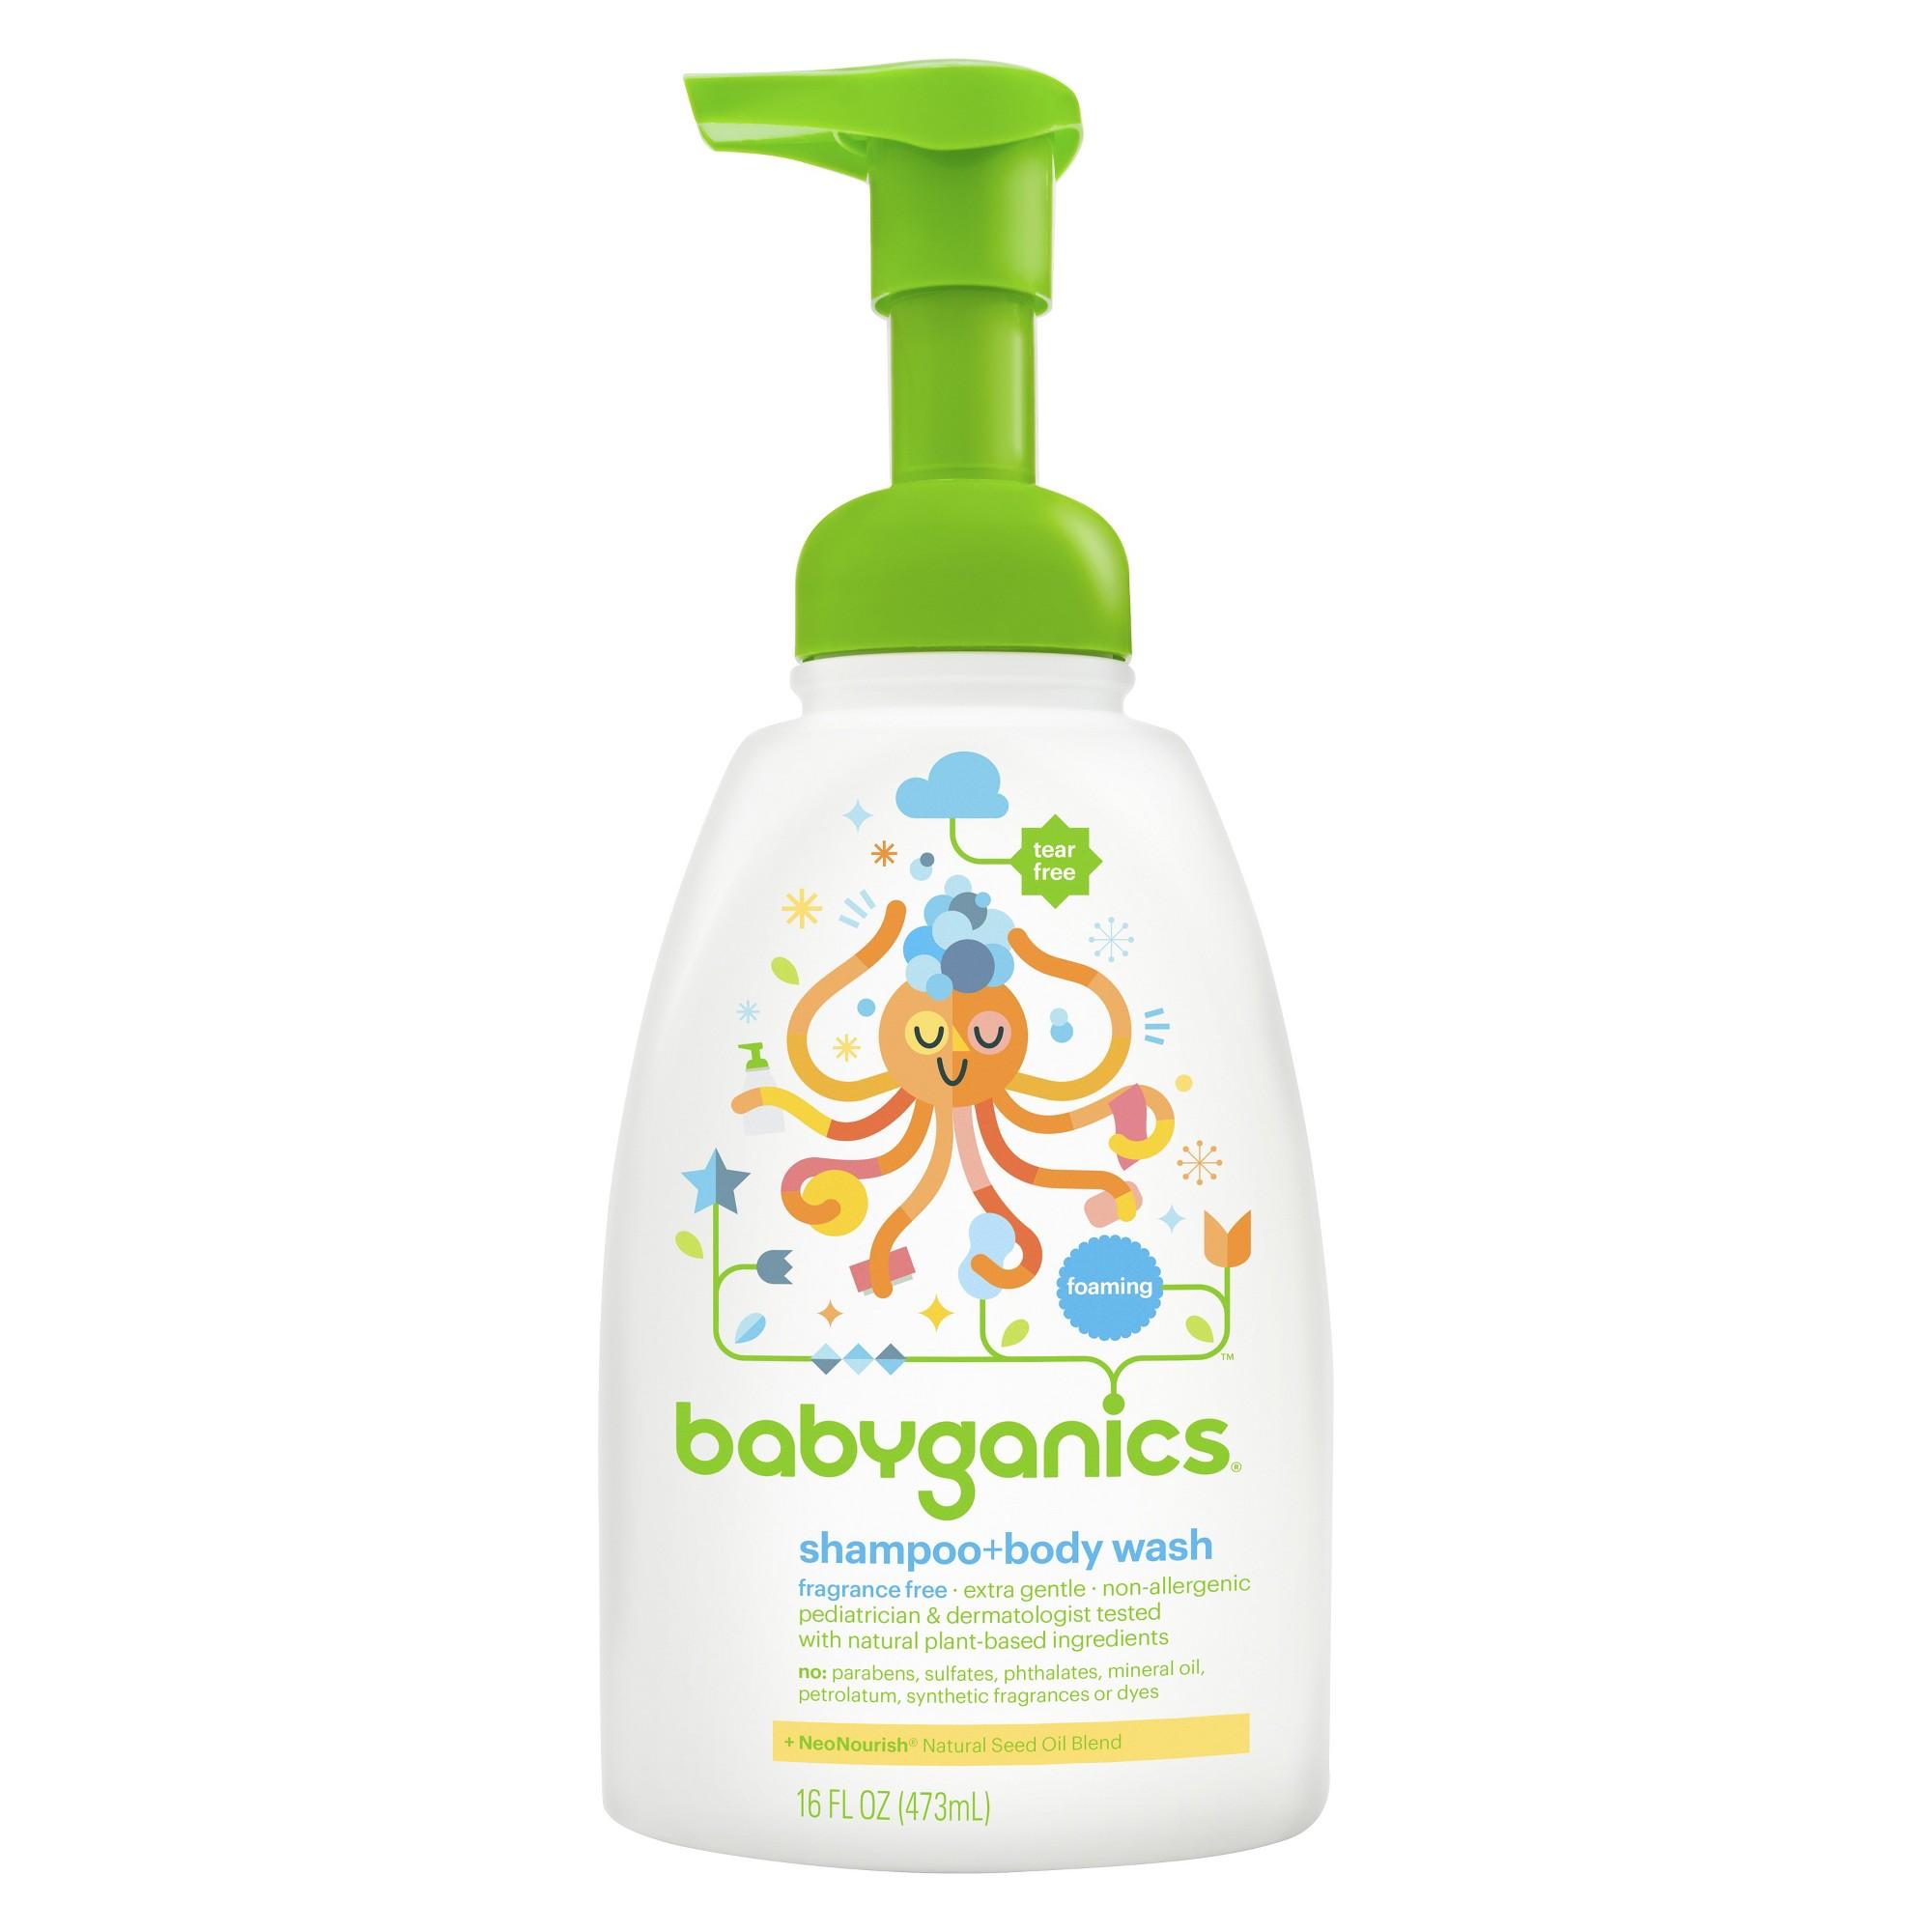 Babyganics baby shampoo body wash fragrance free 16oz